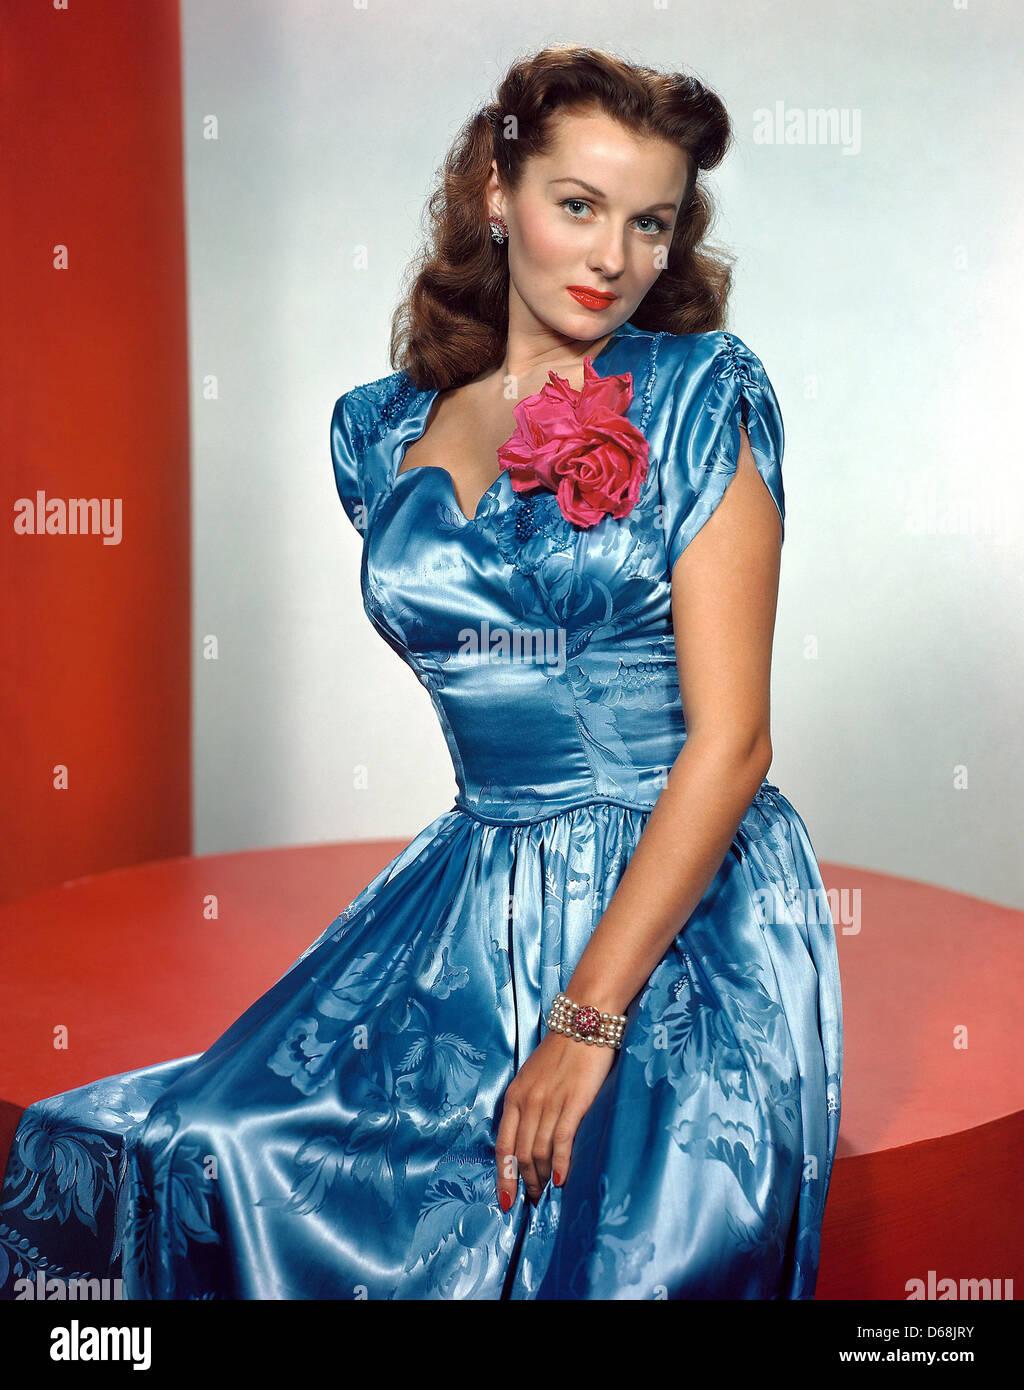 RHONDA FLEMING  US film actress about 1945 - Stock Image